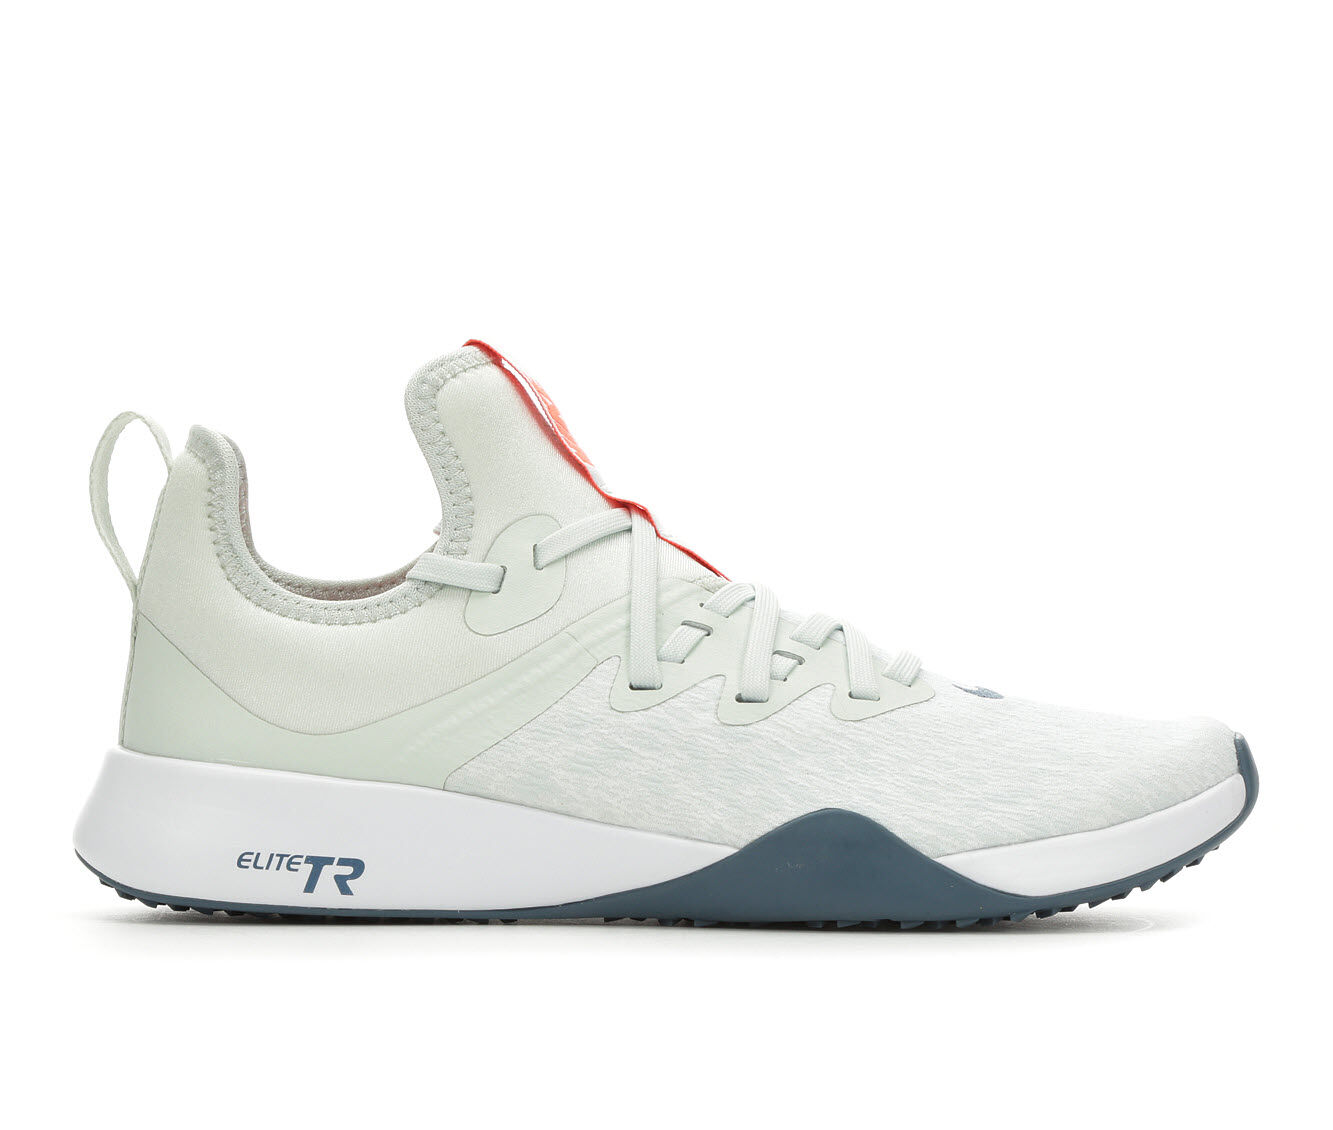 Women's Nike Foundation Elite TR Training Shoes Grn/Thunder/Red